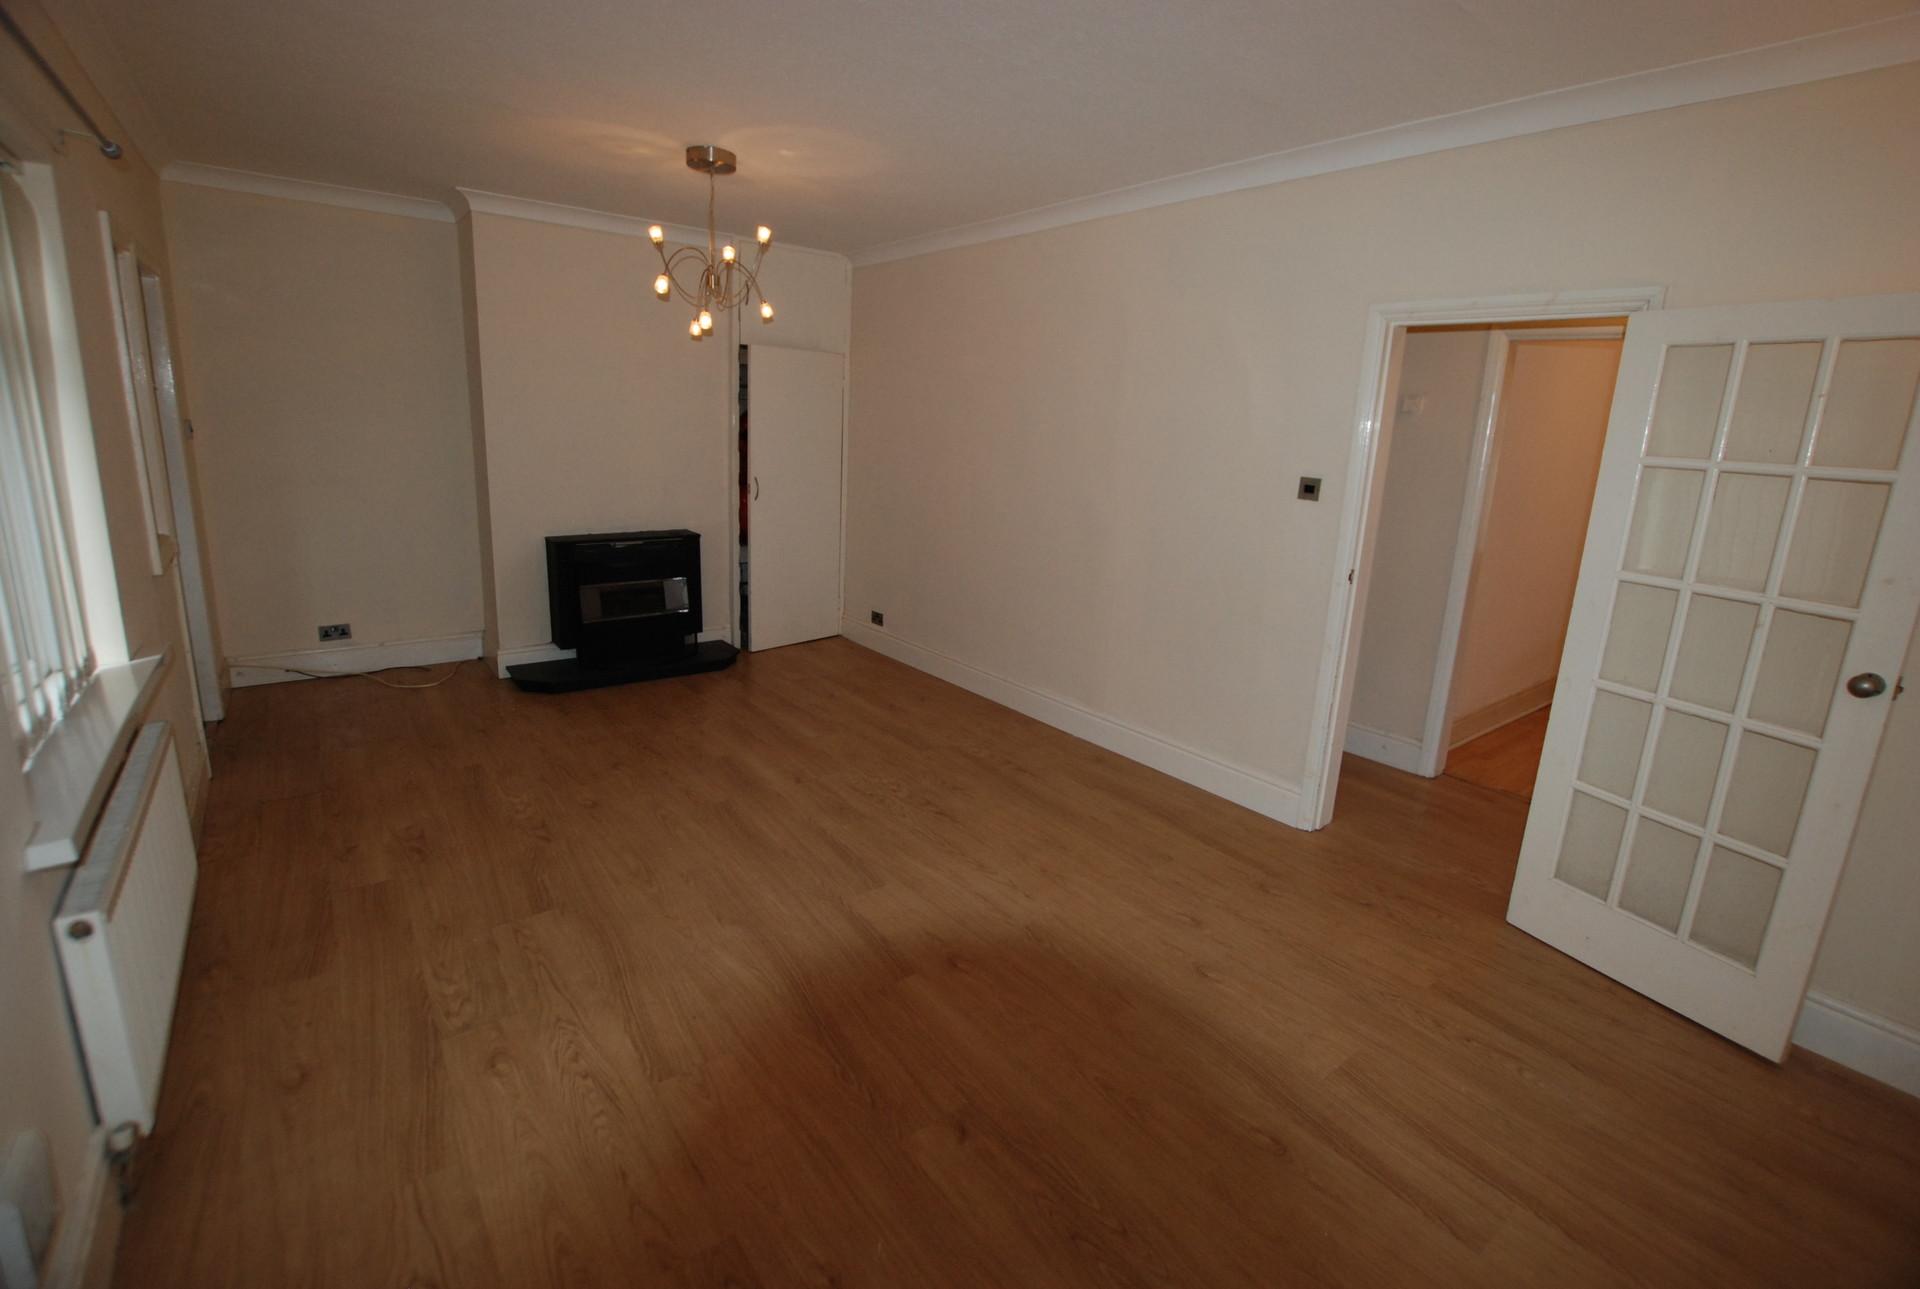 Two bedroomed ground floor flat in the popular Denton Burn